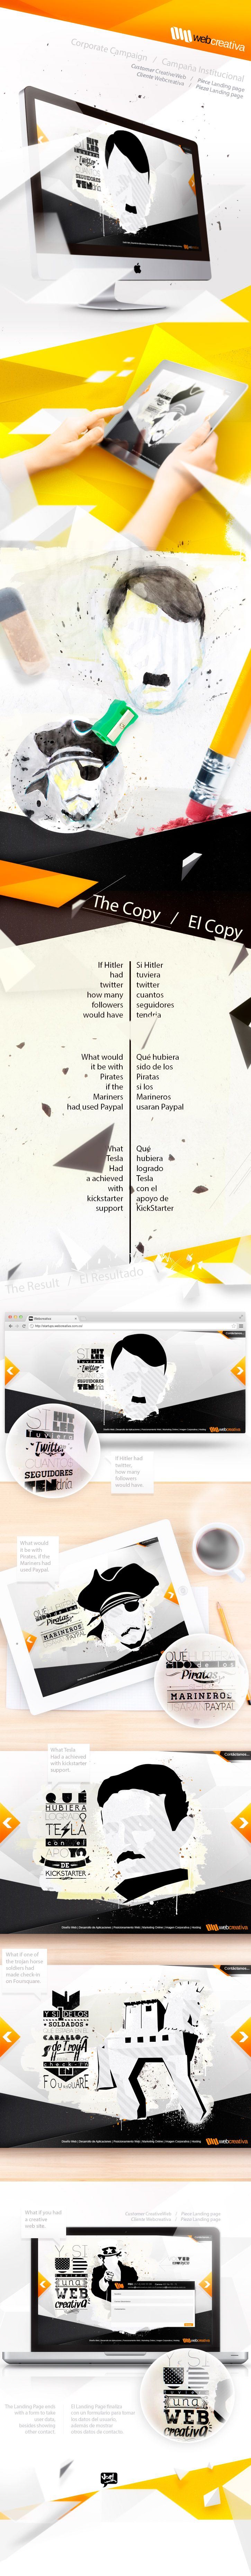 Web Creativa - via @Behance - http://www.behance.net/gallery/Campana-Institucional-WebCreativa/9298989